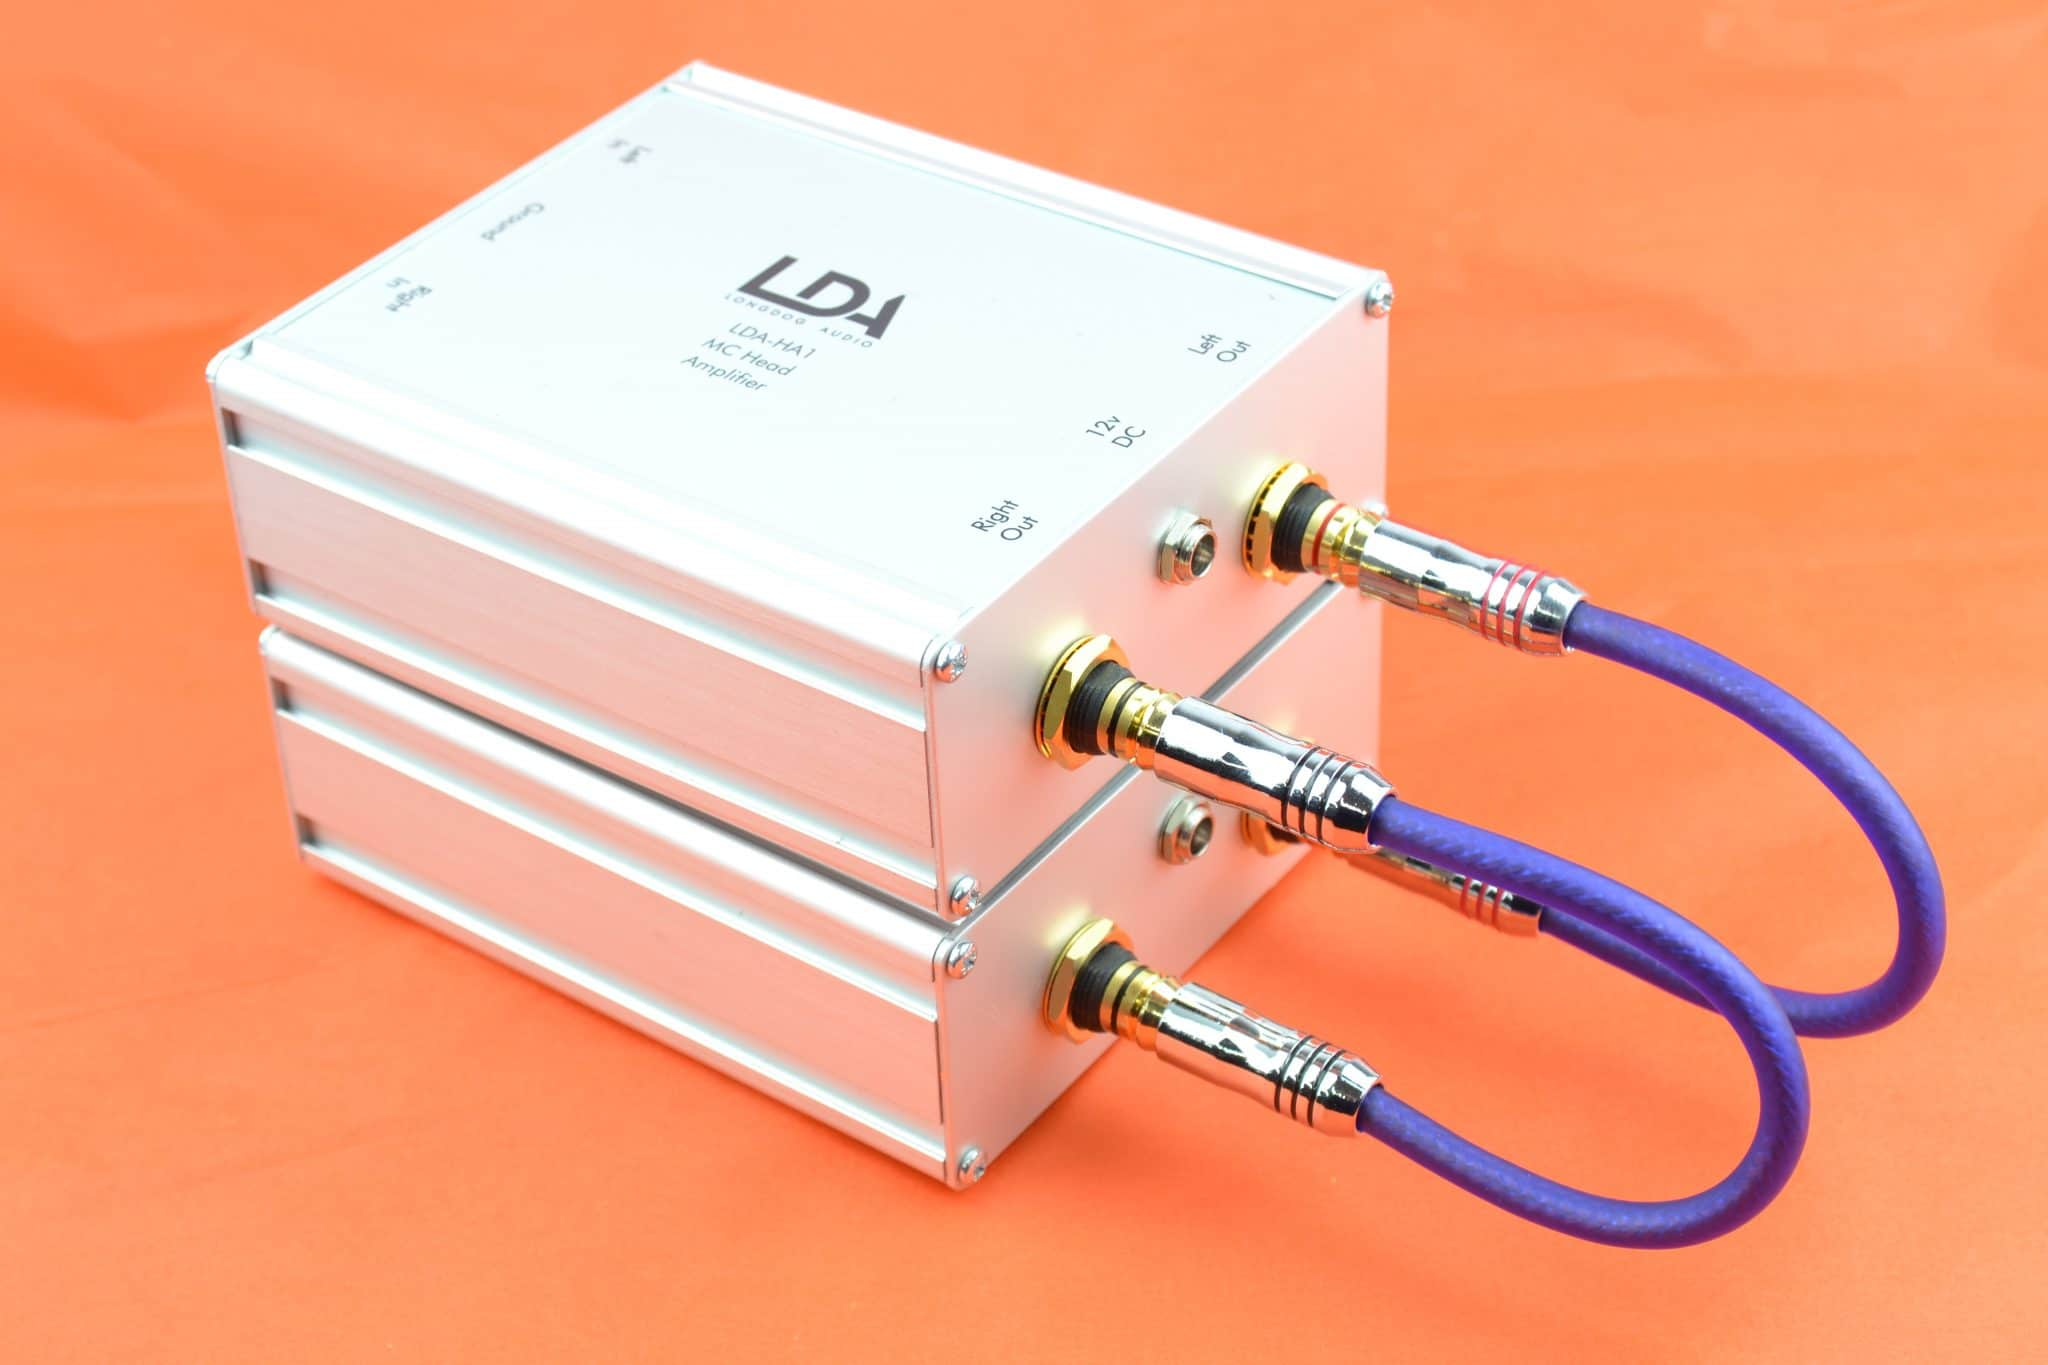 PH-1 & HA-1 Phono Amplifiers From Longdog